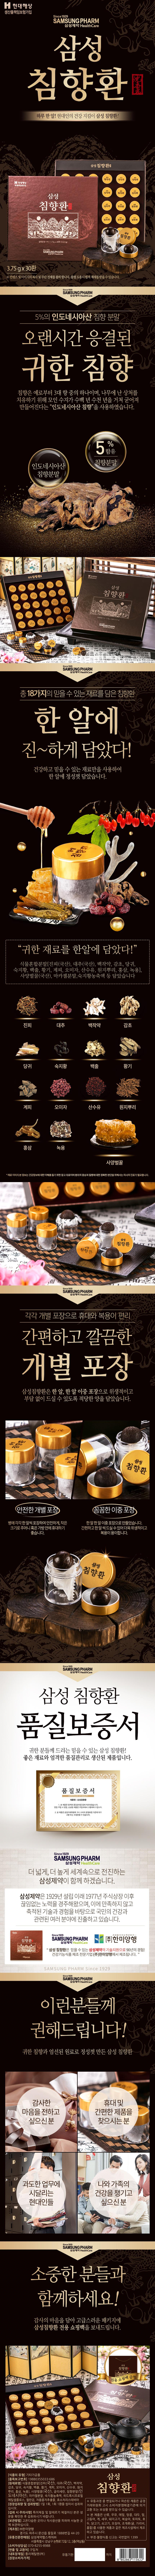 Samsung hwan